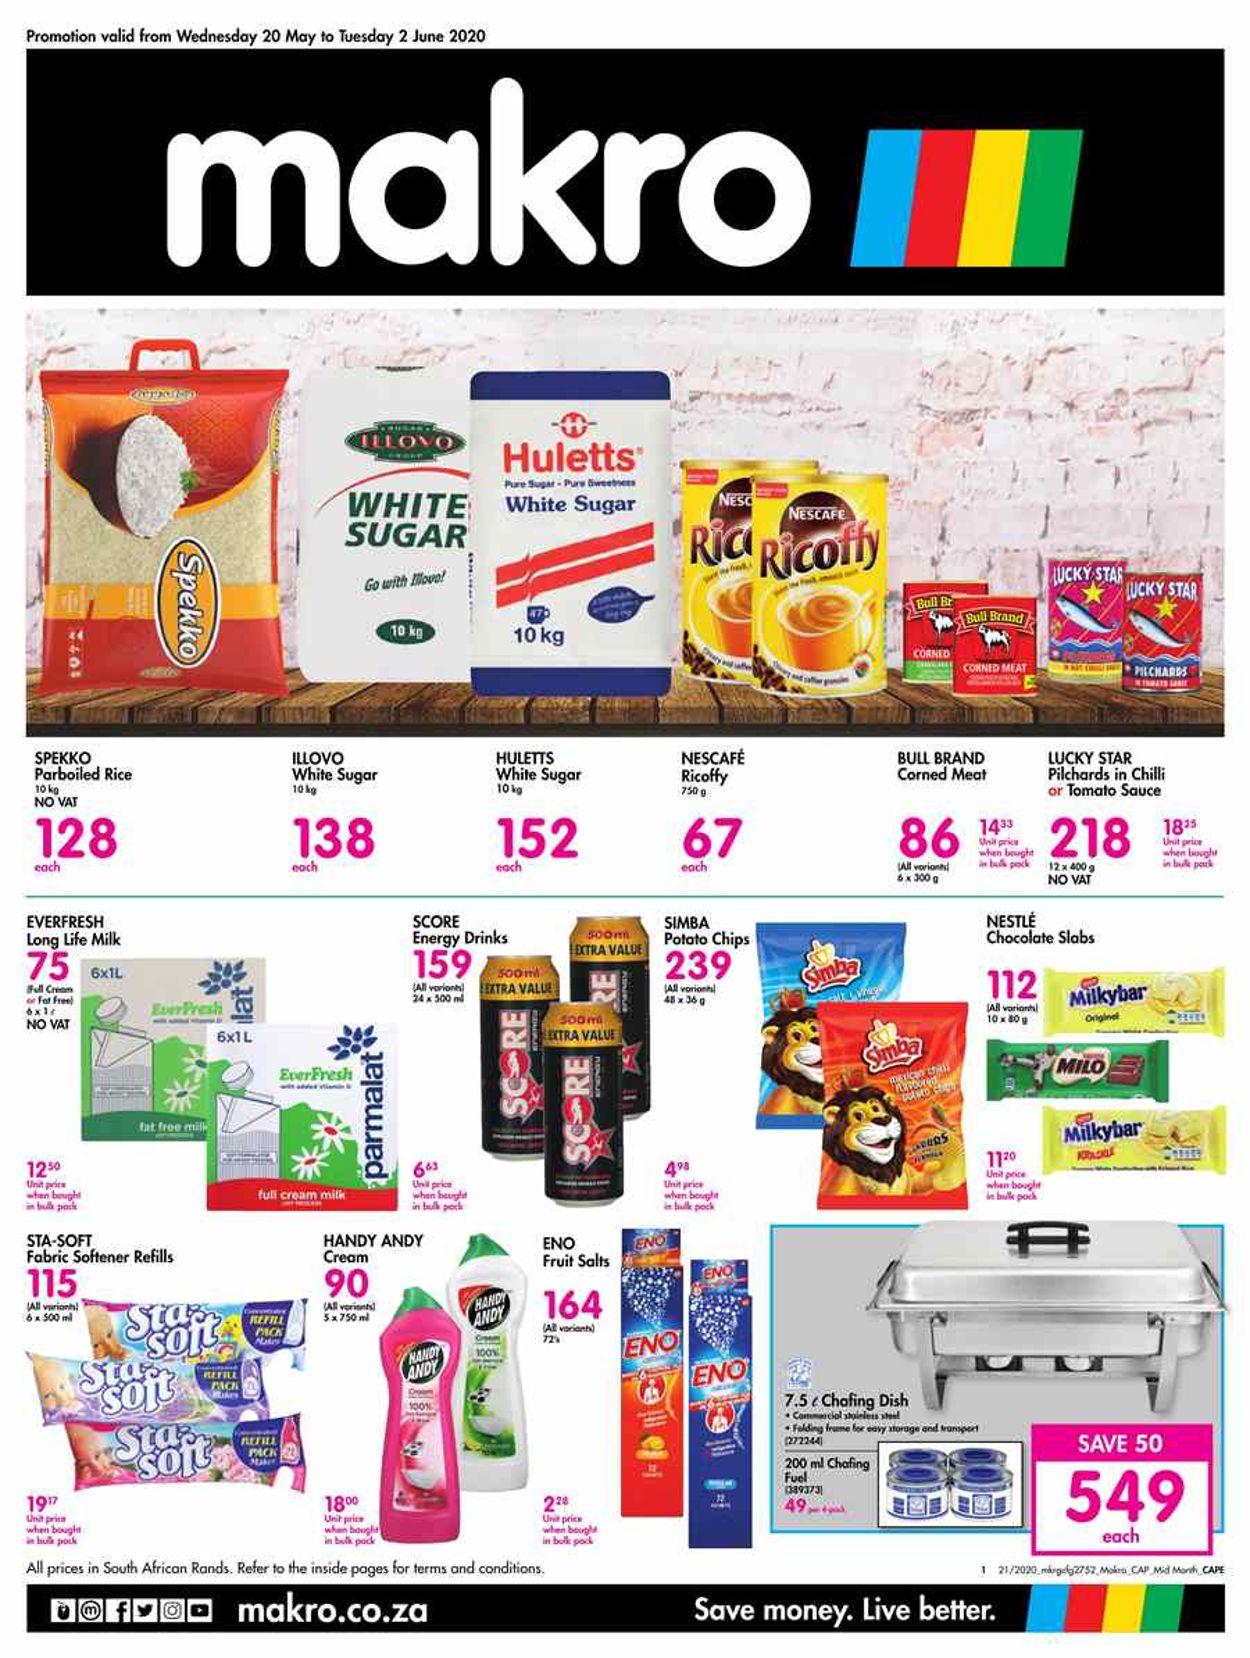 Makro Catalogue - 2020/05/20-2020/06/02